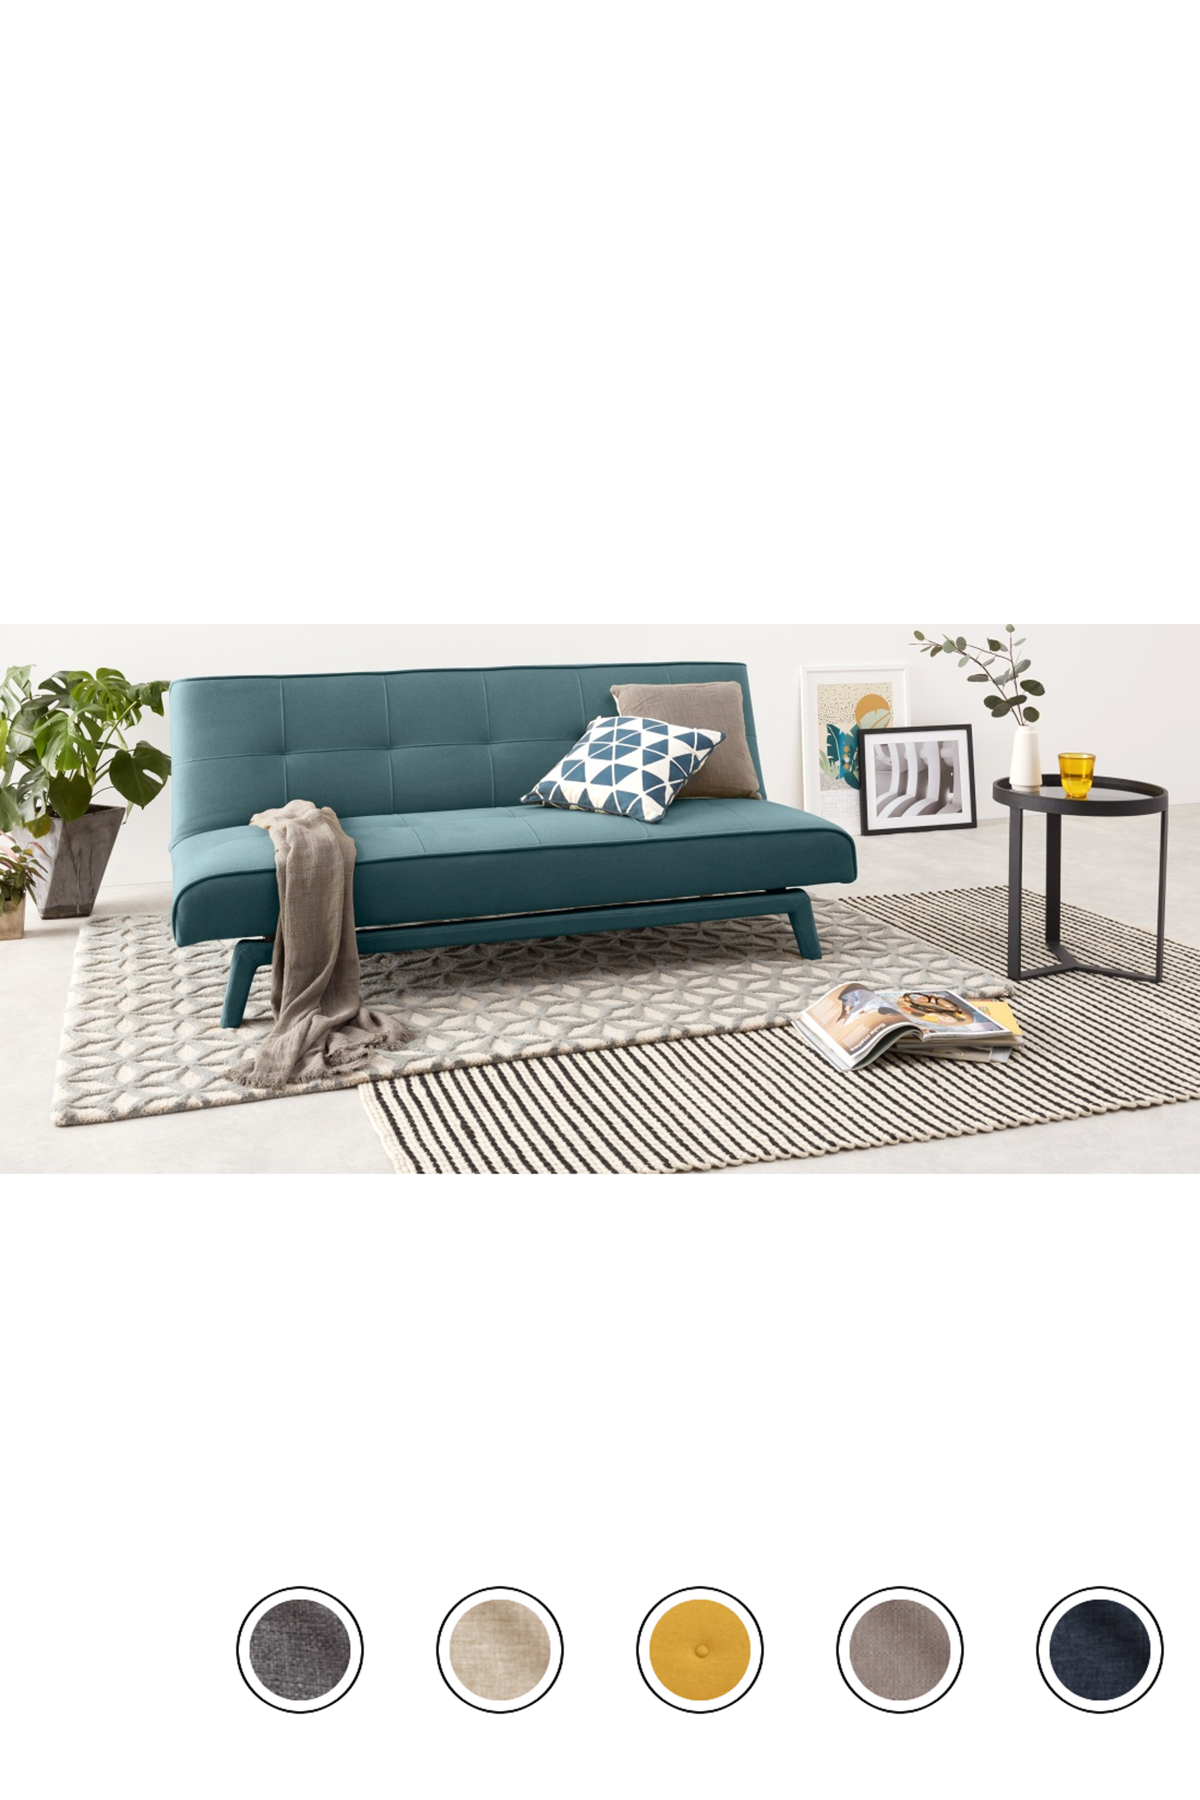 Yoko Click Clack Sofa Bed Sherbet Blue Sofa Bed For Small Spaces Sofa Minimalist Sofa